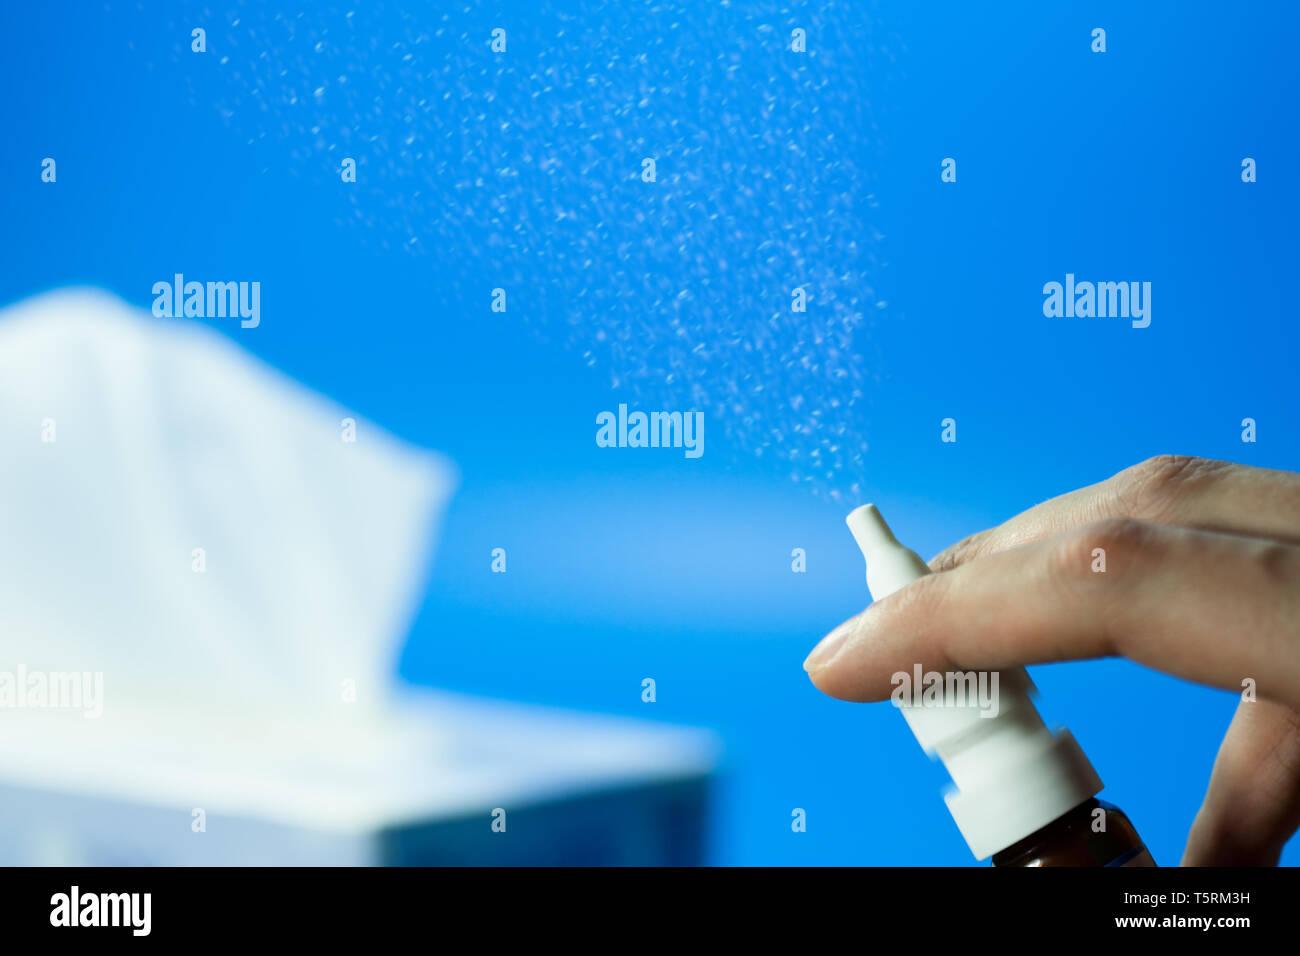 nasal spray and tissues - allergy and flu season concept Stock Photo